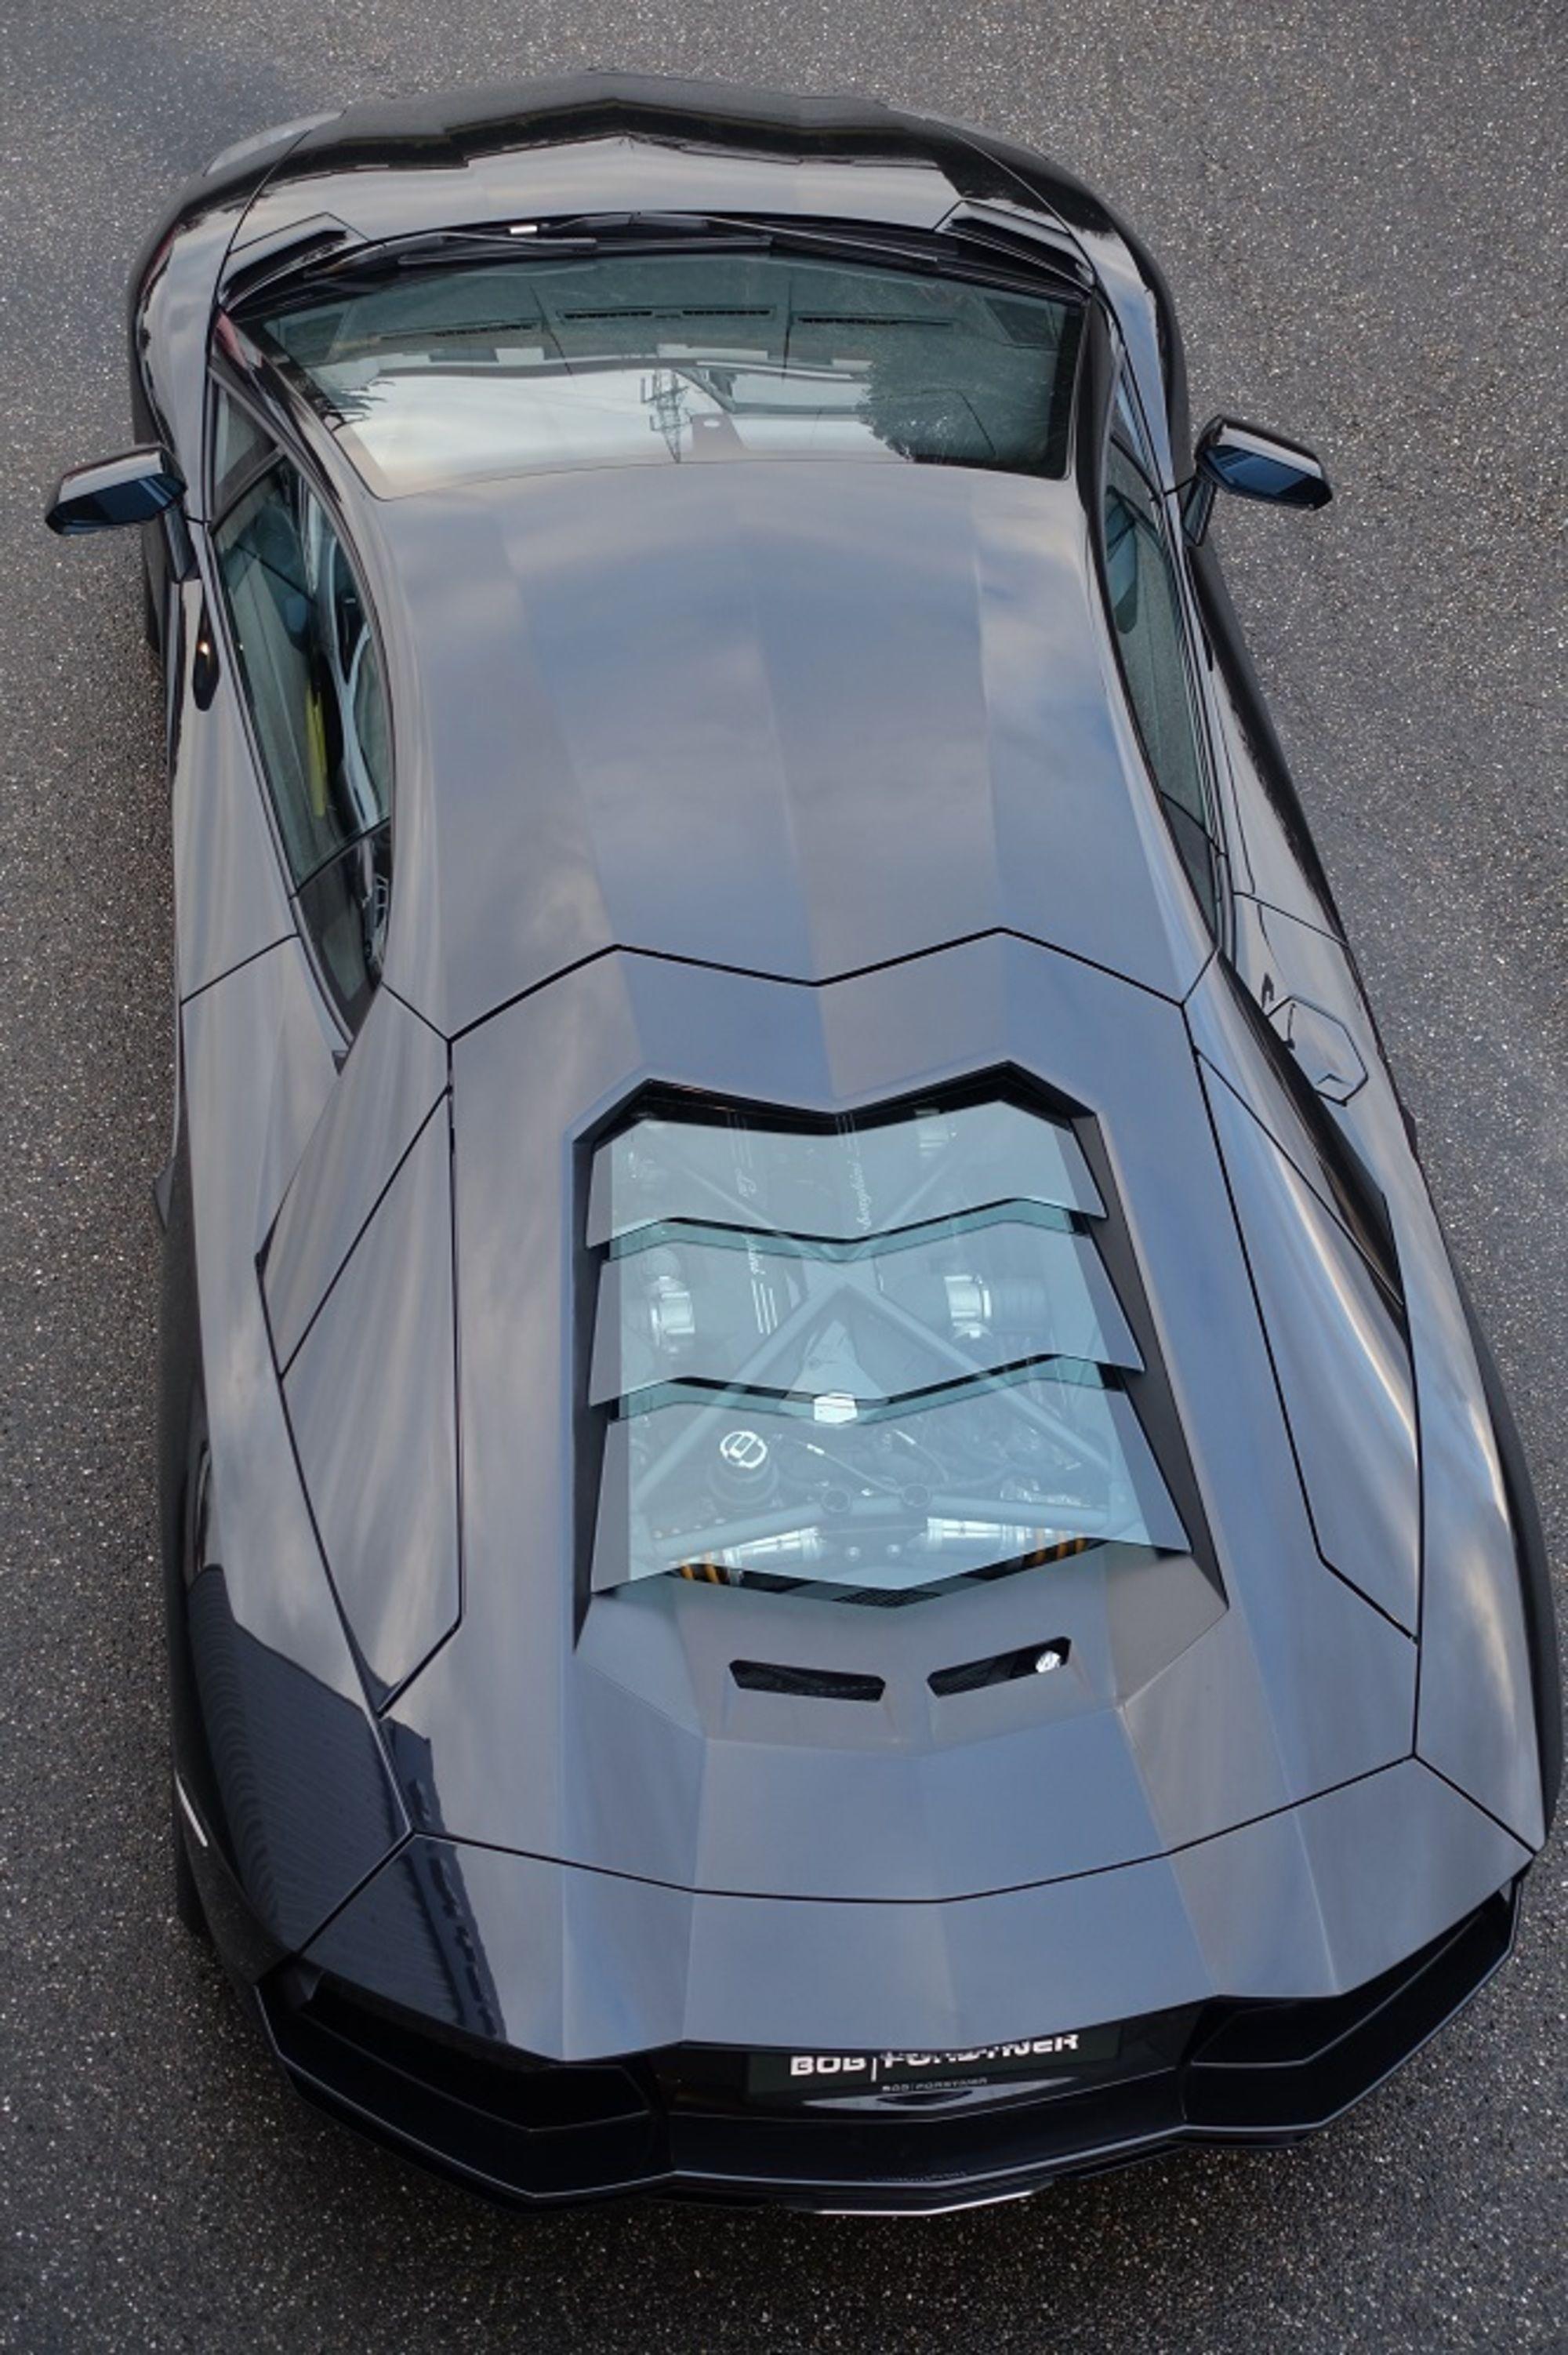 2012 Lamborghini Aventador In London United Kingdom For Sale On